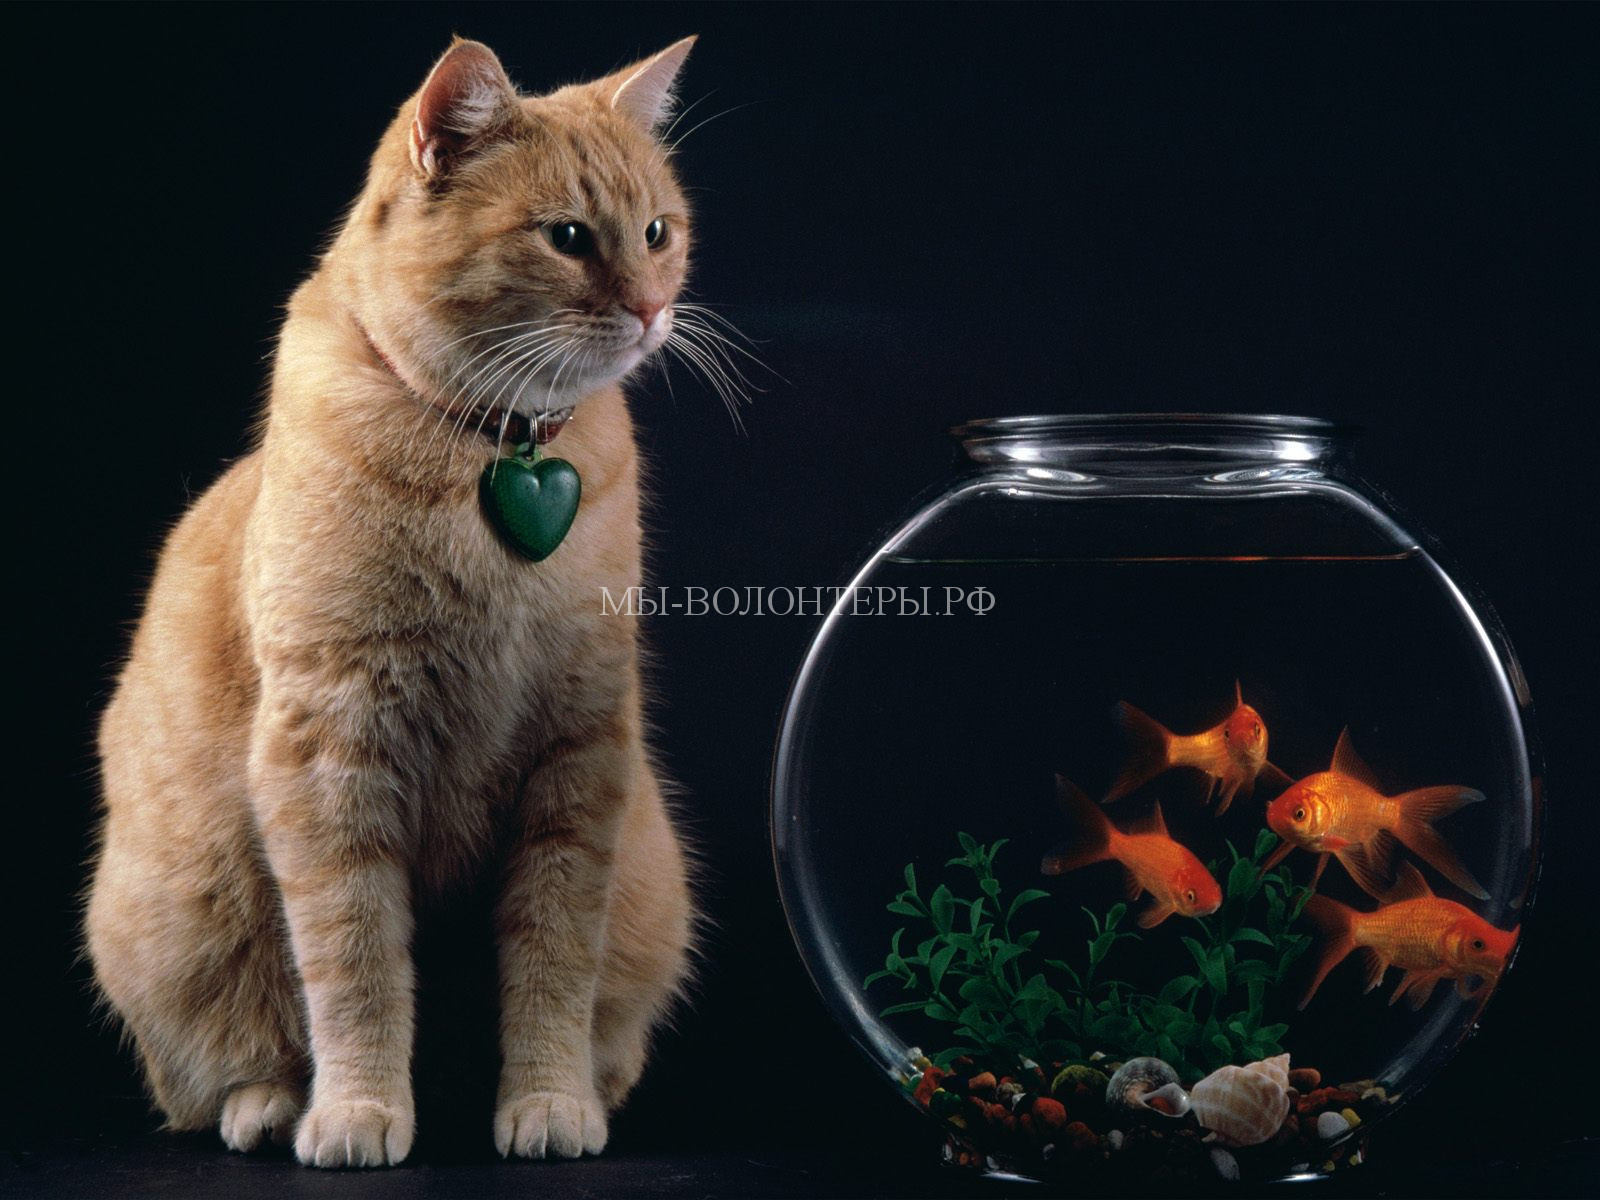 Cats019